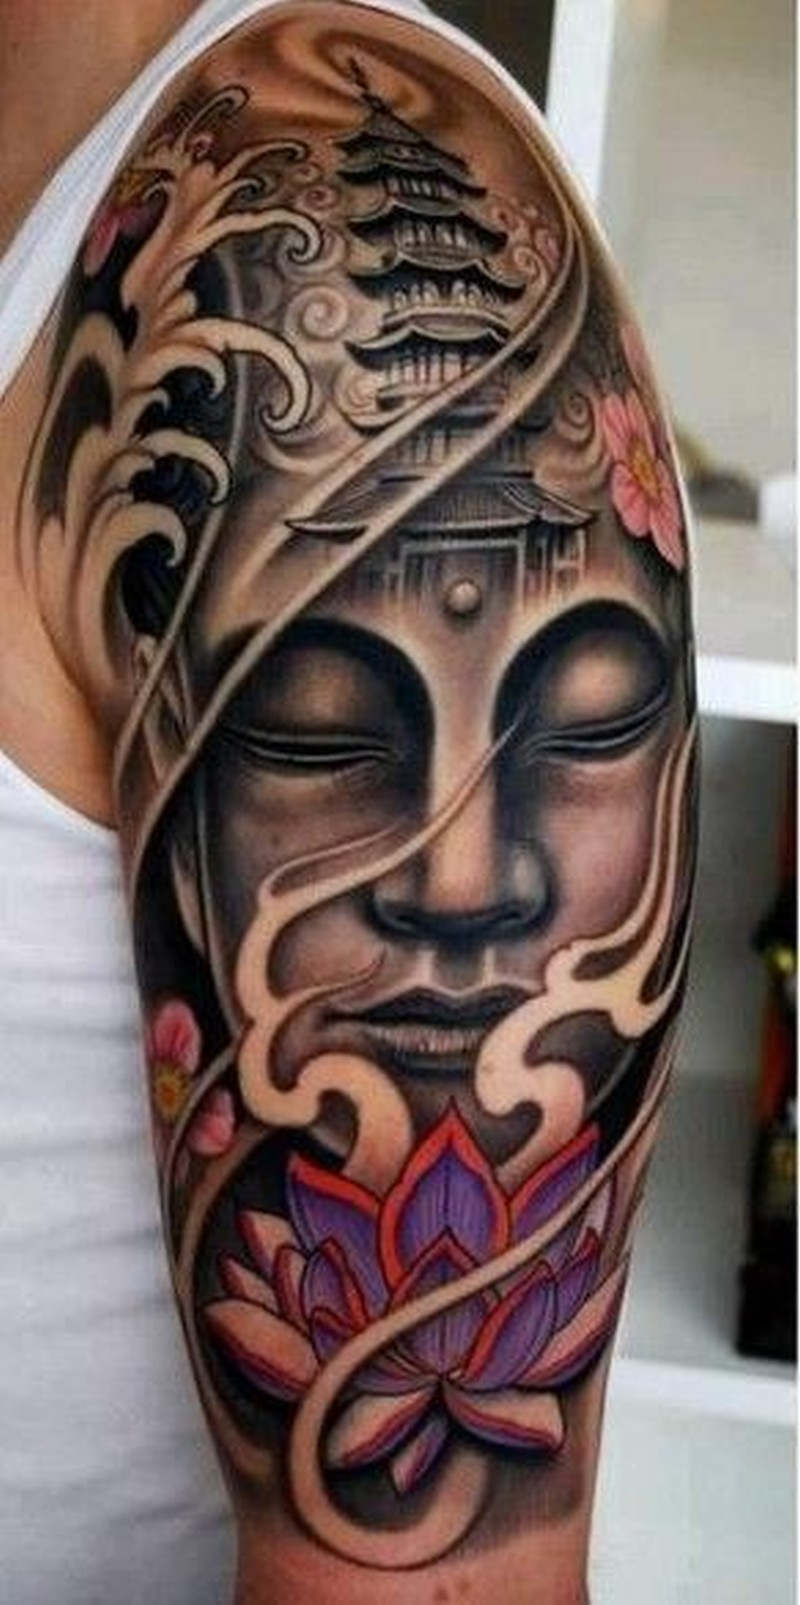 lovely face buddha witn lotus tattoo on arm tattoos book tattoos designs. Black Bedroom Furniture Sets. Home Design Ideas